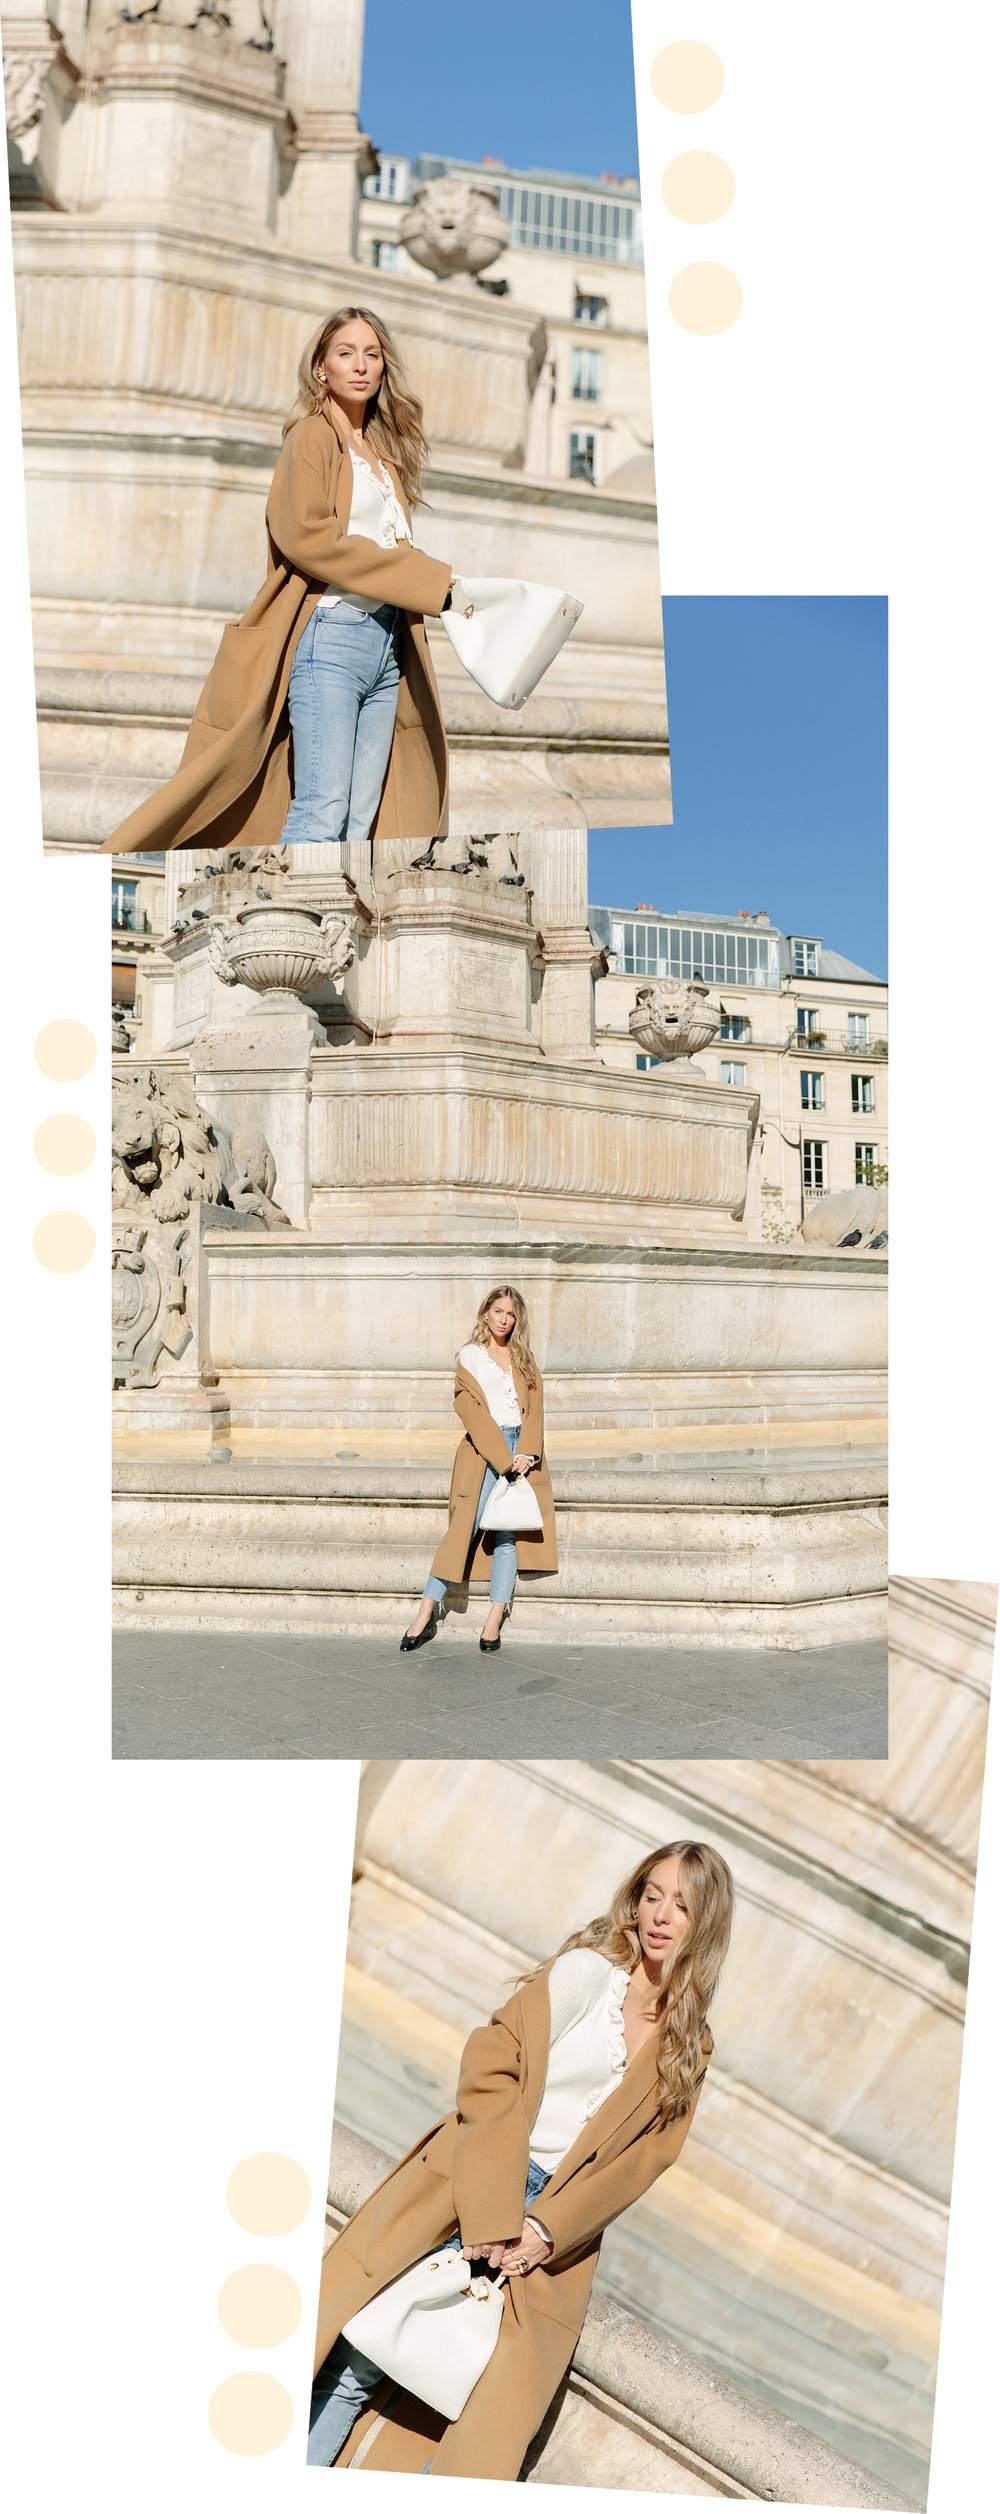 Carin_Olsson_Paris.jpg